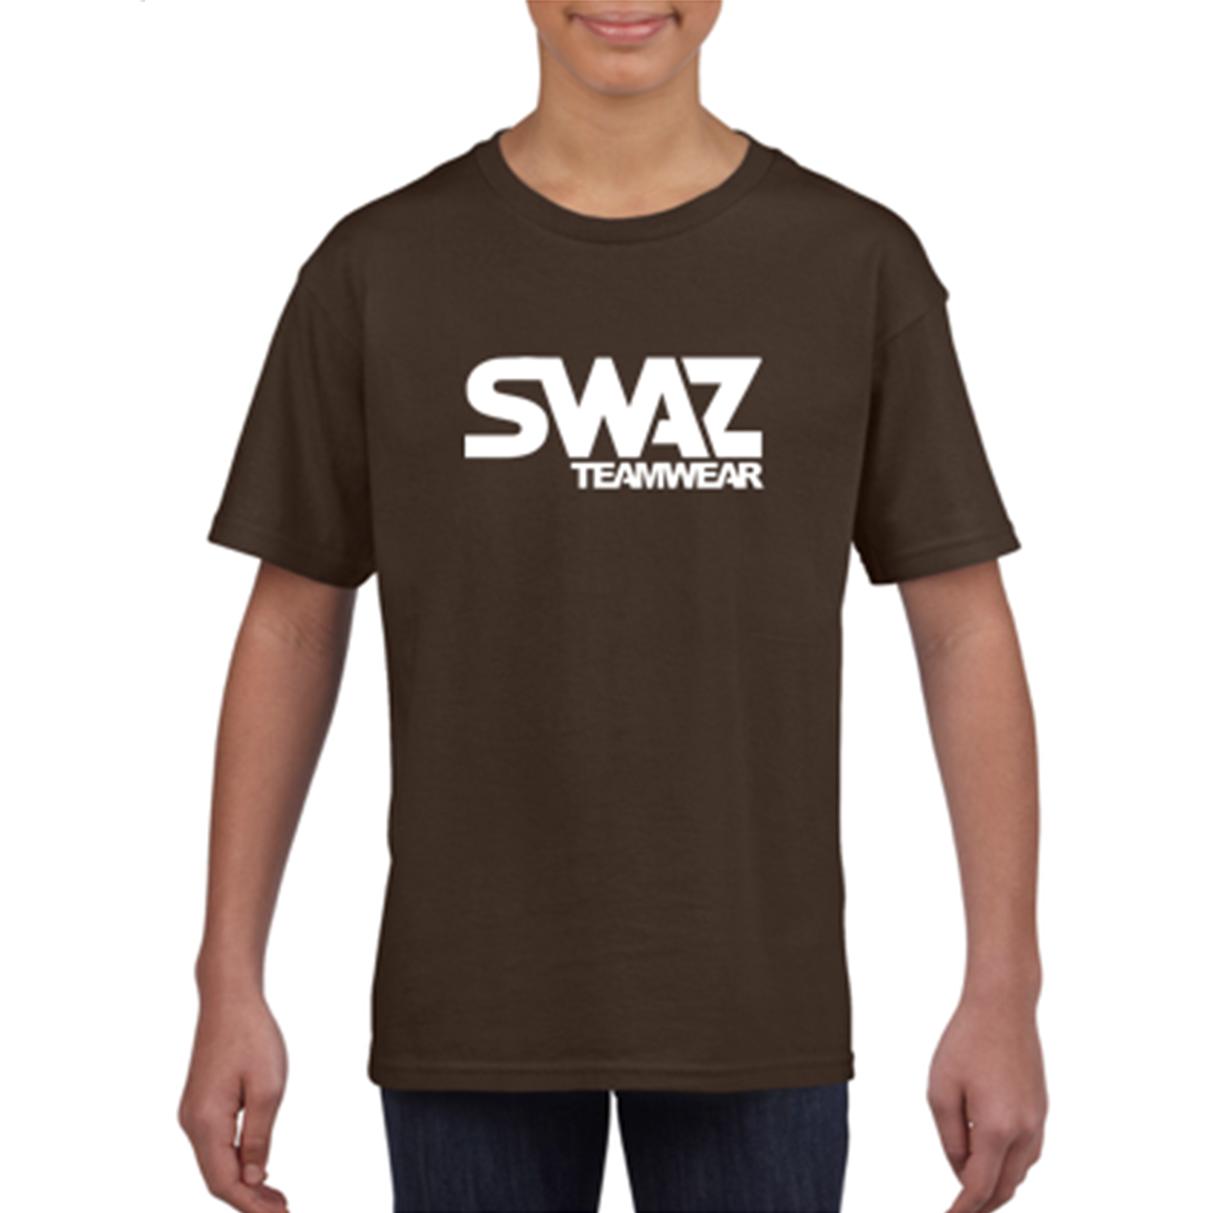 SWAZ Teamwear Dark Chocolate Classic T-Shirt